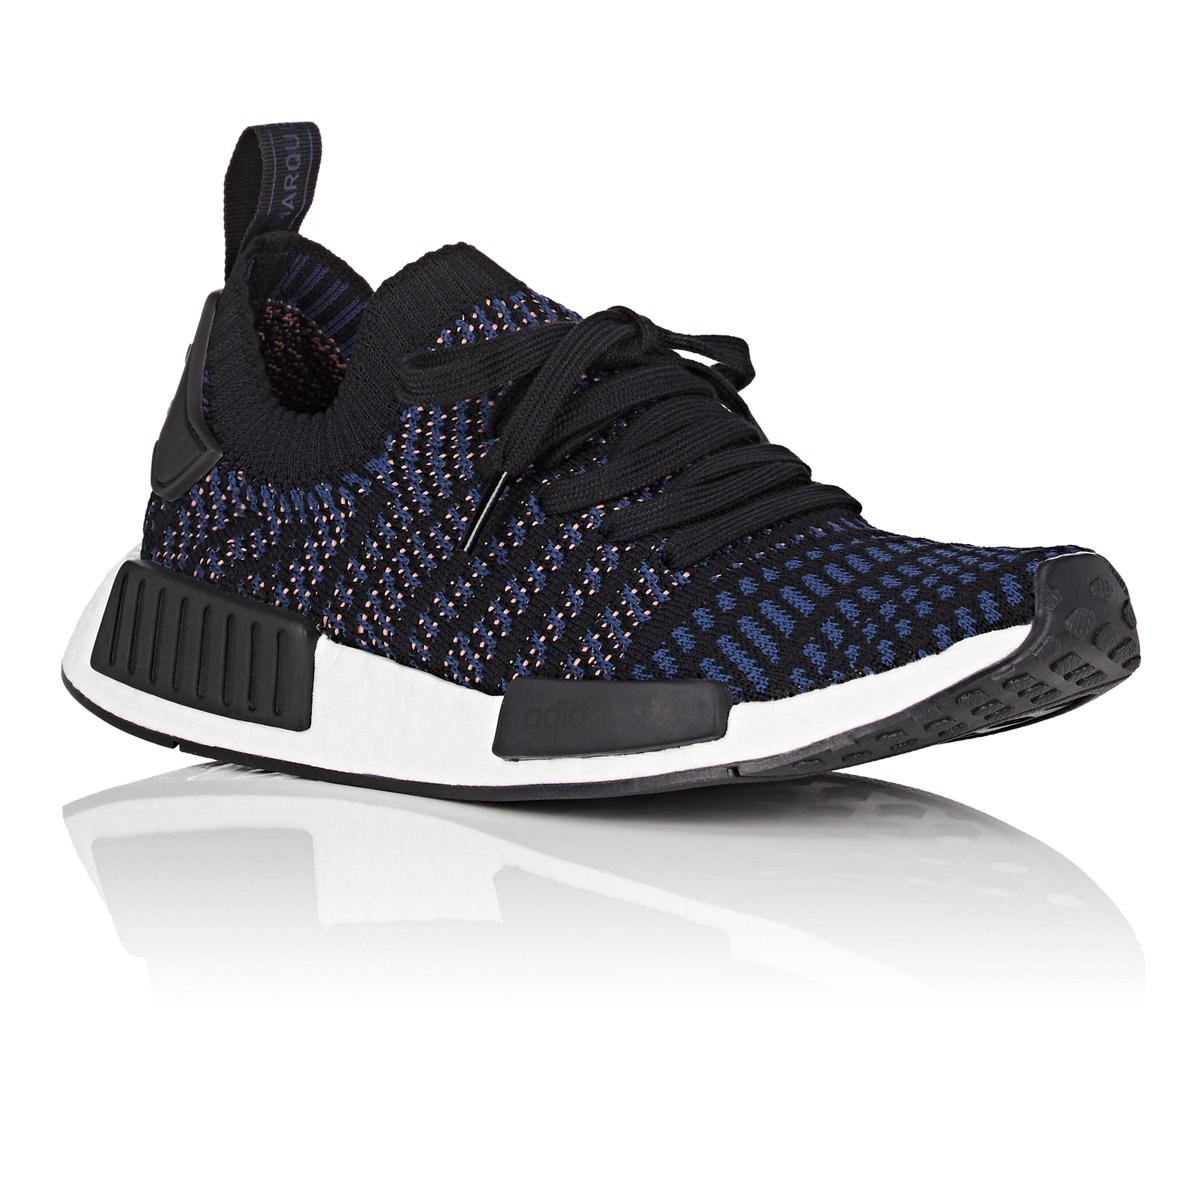 quality design 8cde5 08123 Adidas - Black Nmd R1 Stlt Primeknit Sneakers - Lyst. View fullscreen